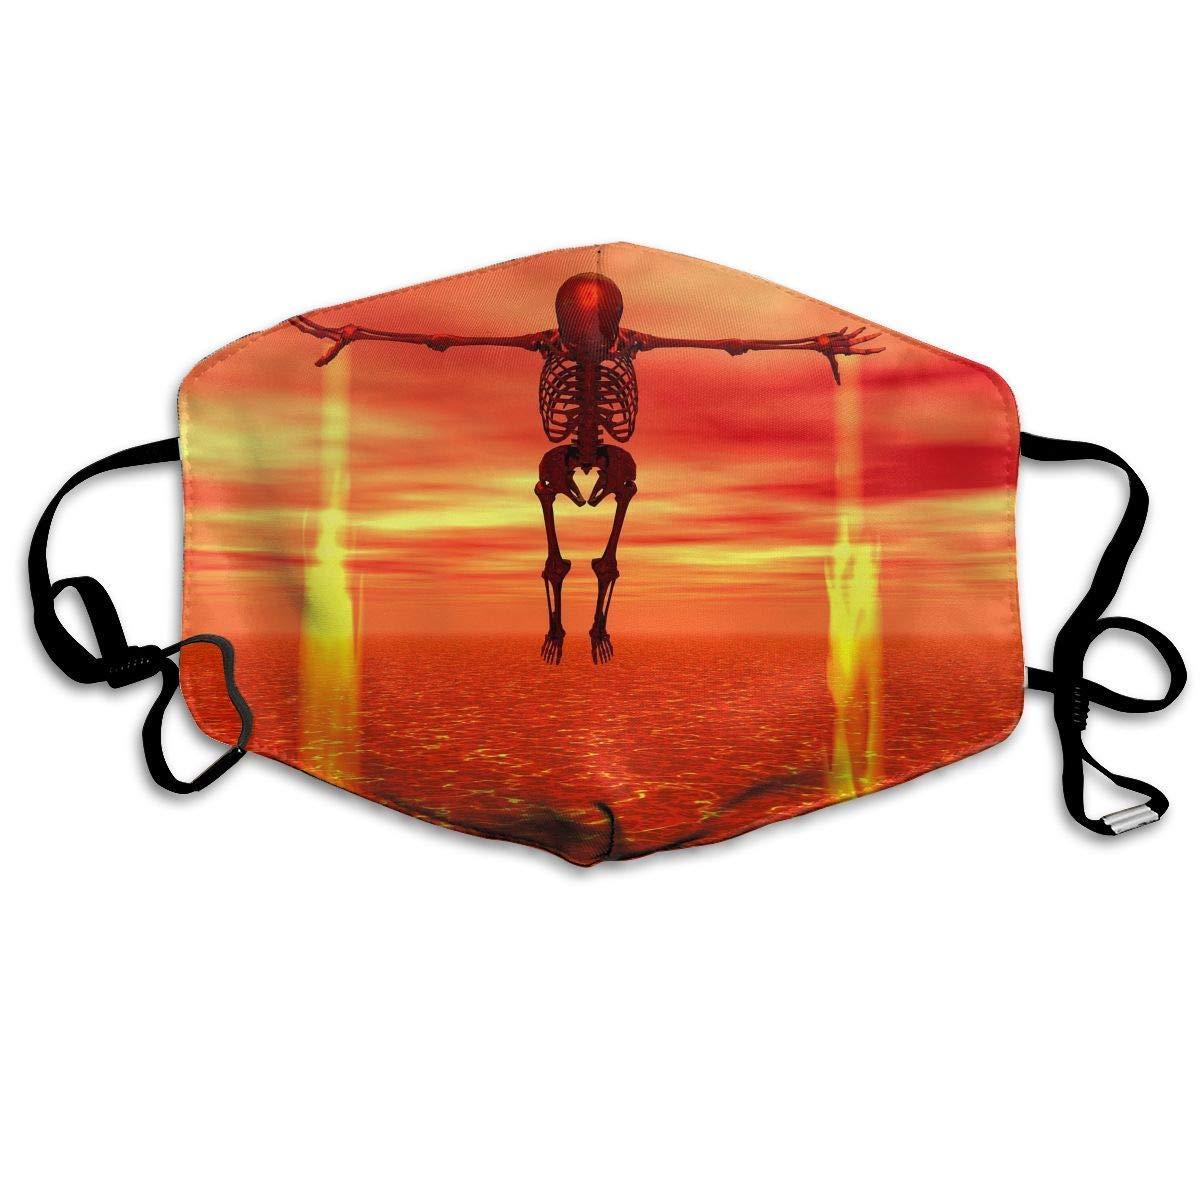 Daawqee Máscara de Boca, Antipolvo Cubierta de Boca Sunset Skeleton Print Reusable Washable Earloop Máscara de Boca for Men Women